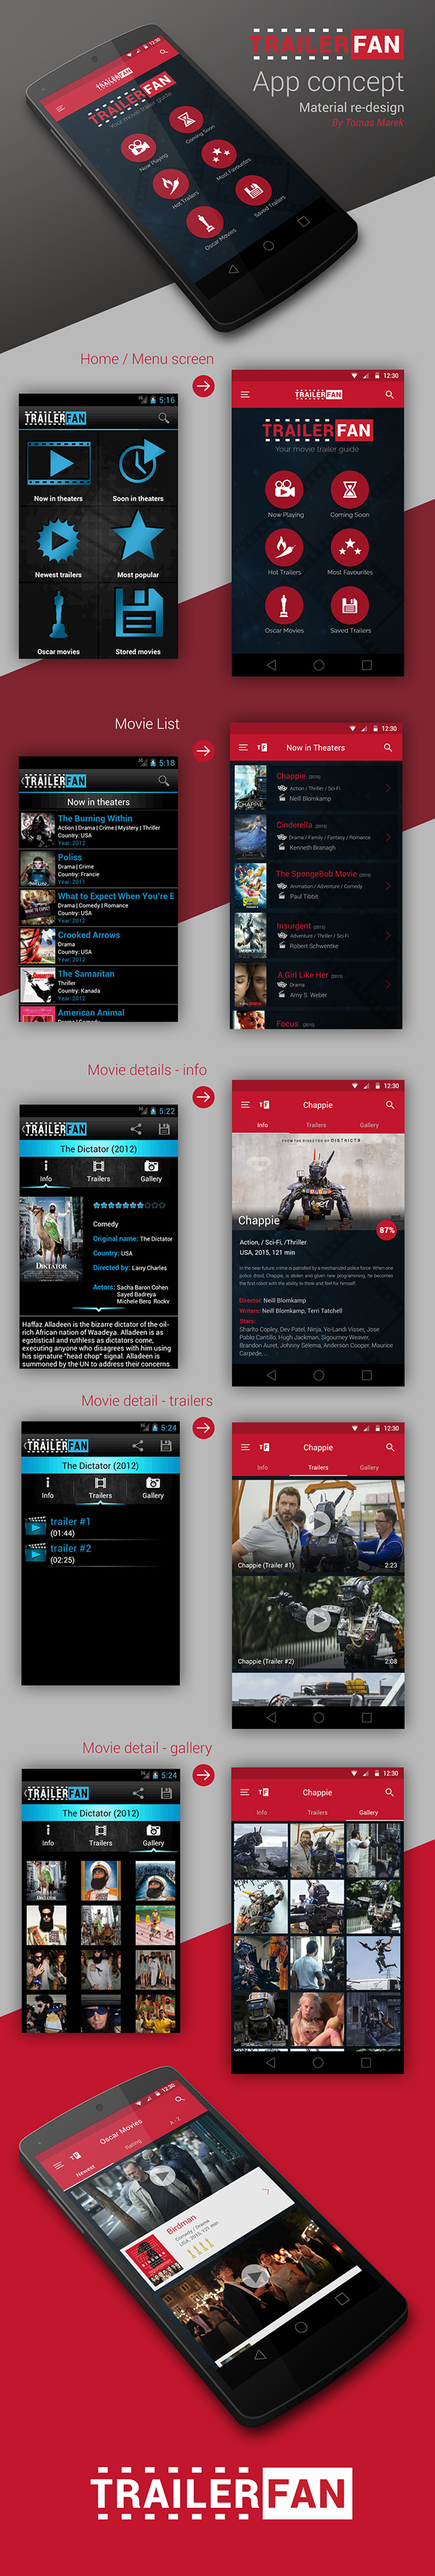 movie trailer mobile material redesign